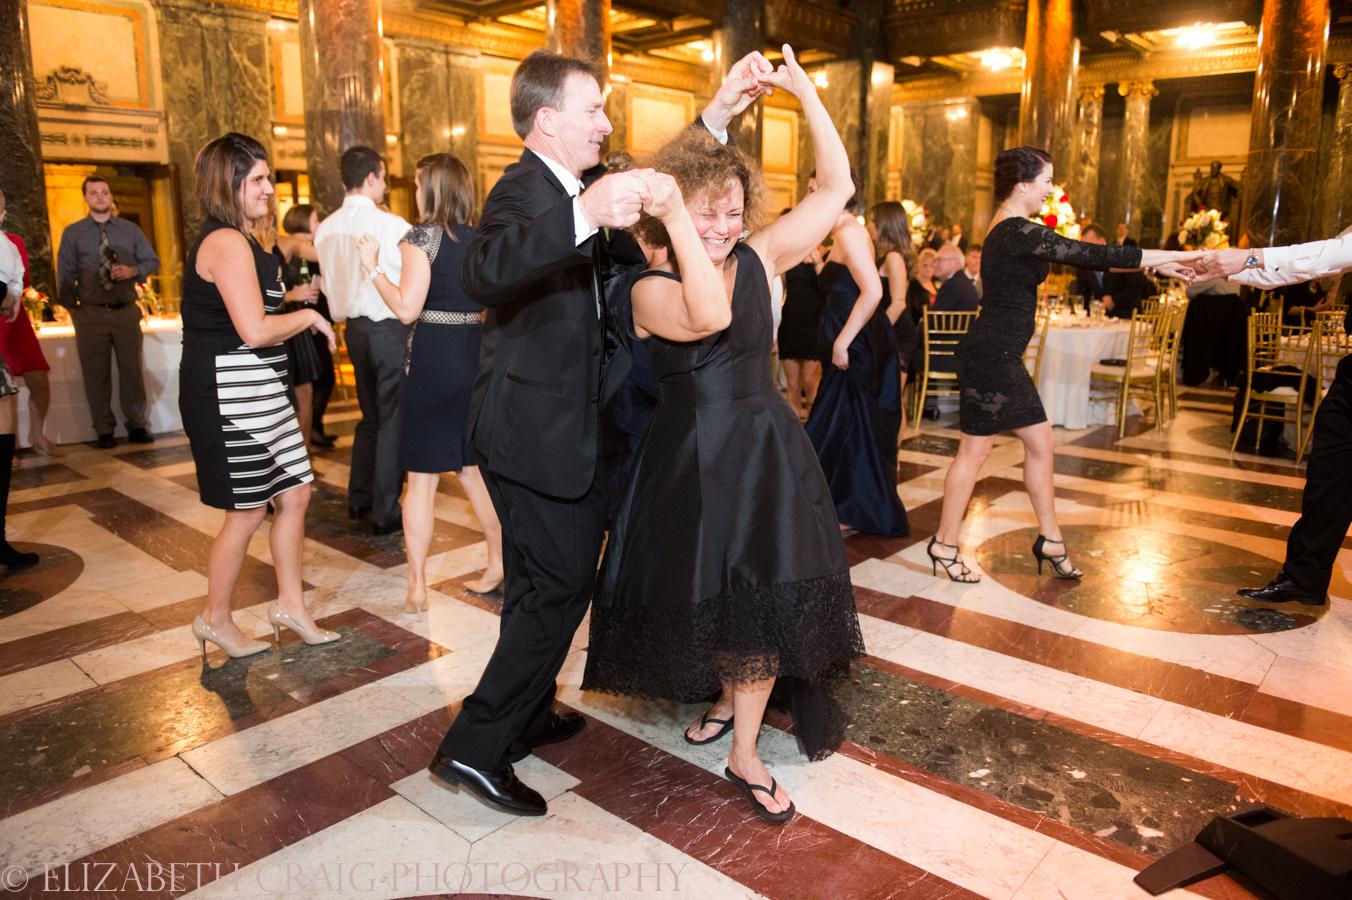 Carnegie Museum of Art Weddings | Elizabeth Craig Photography-0149